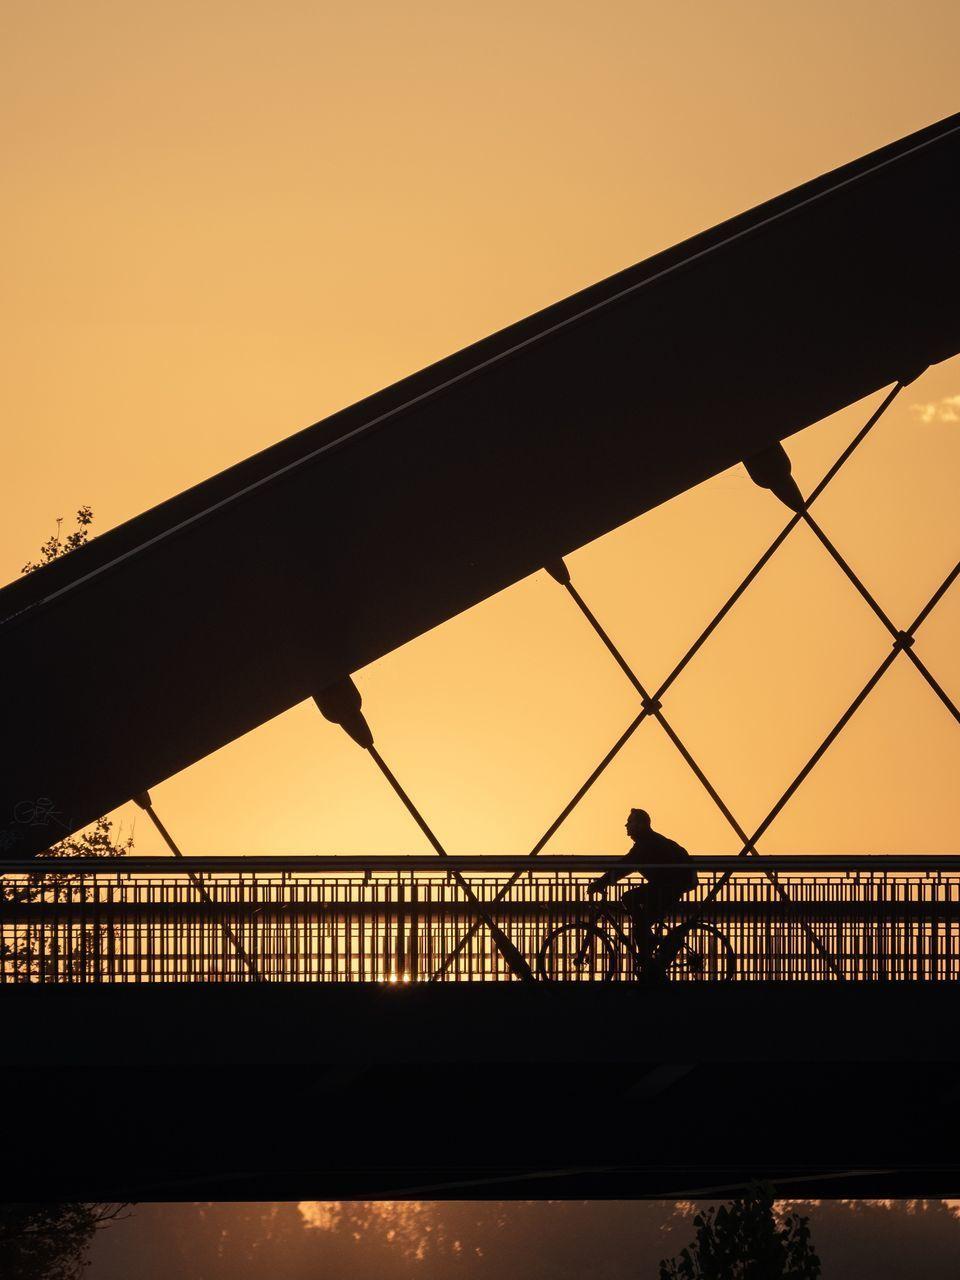 SILHOUETTE MAN BRIDGE AGAINST SKY DURING SUNSET